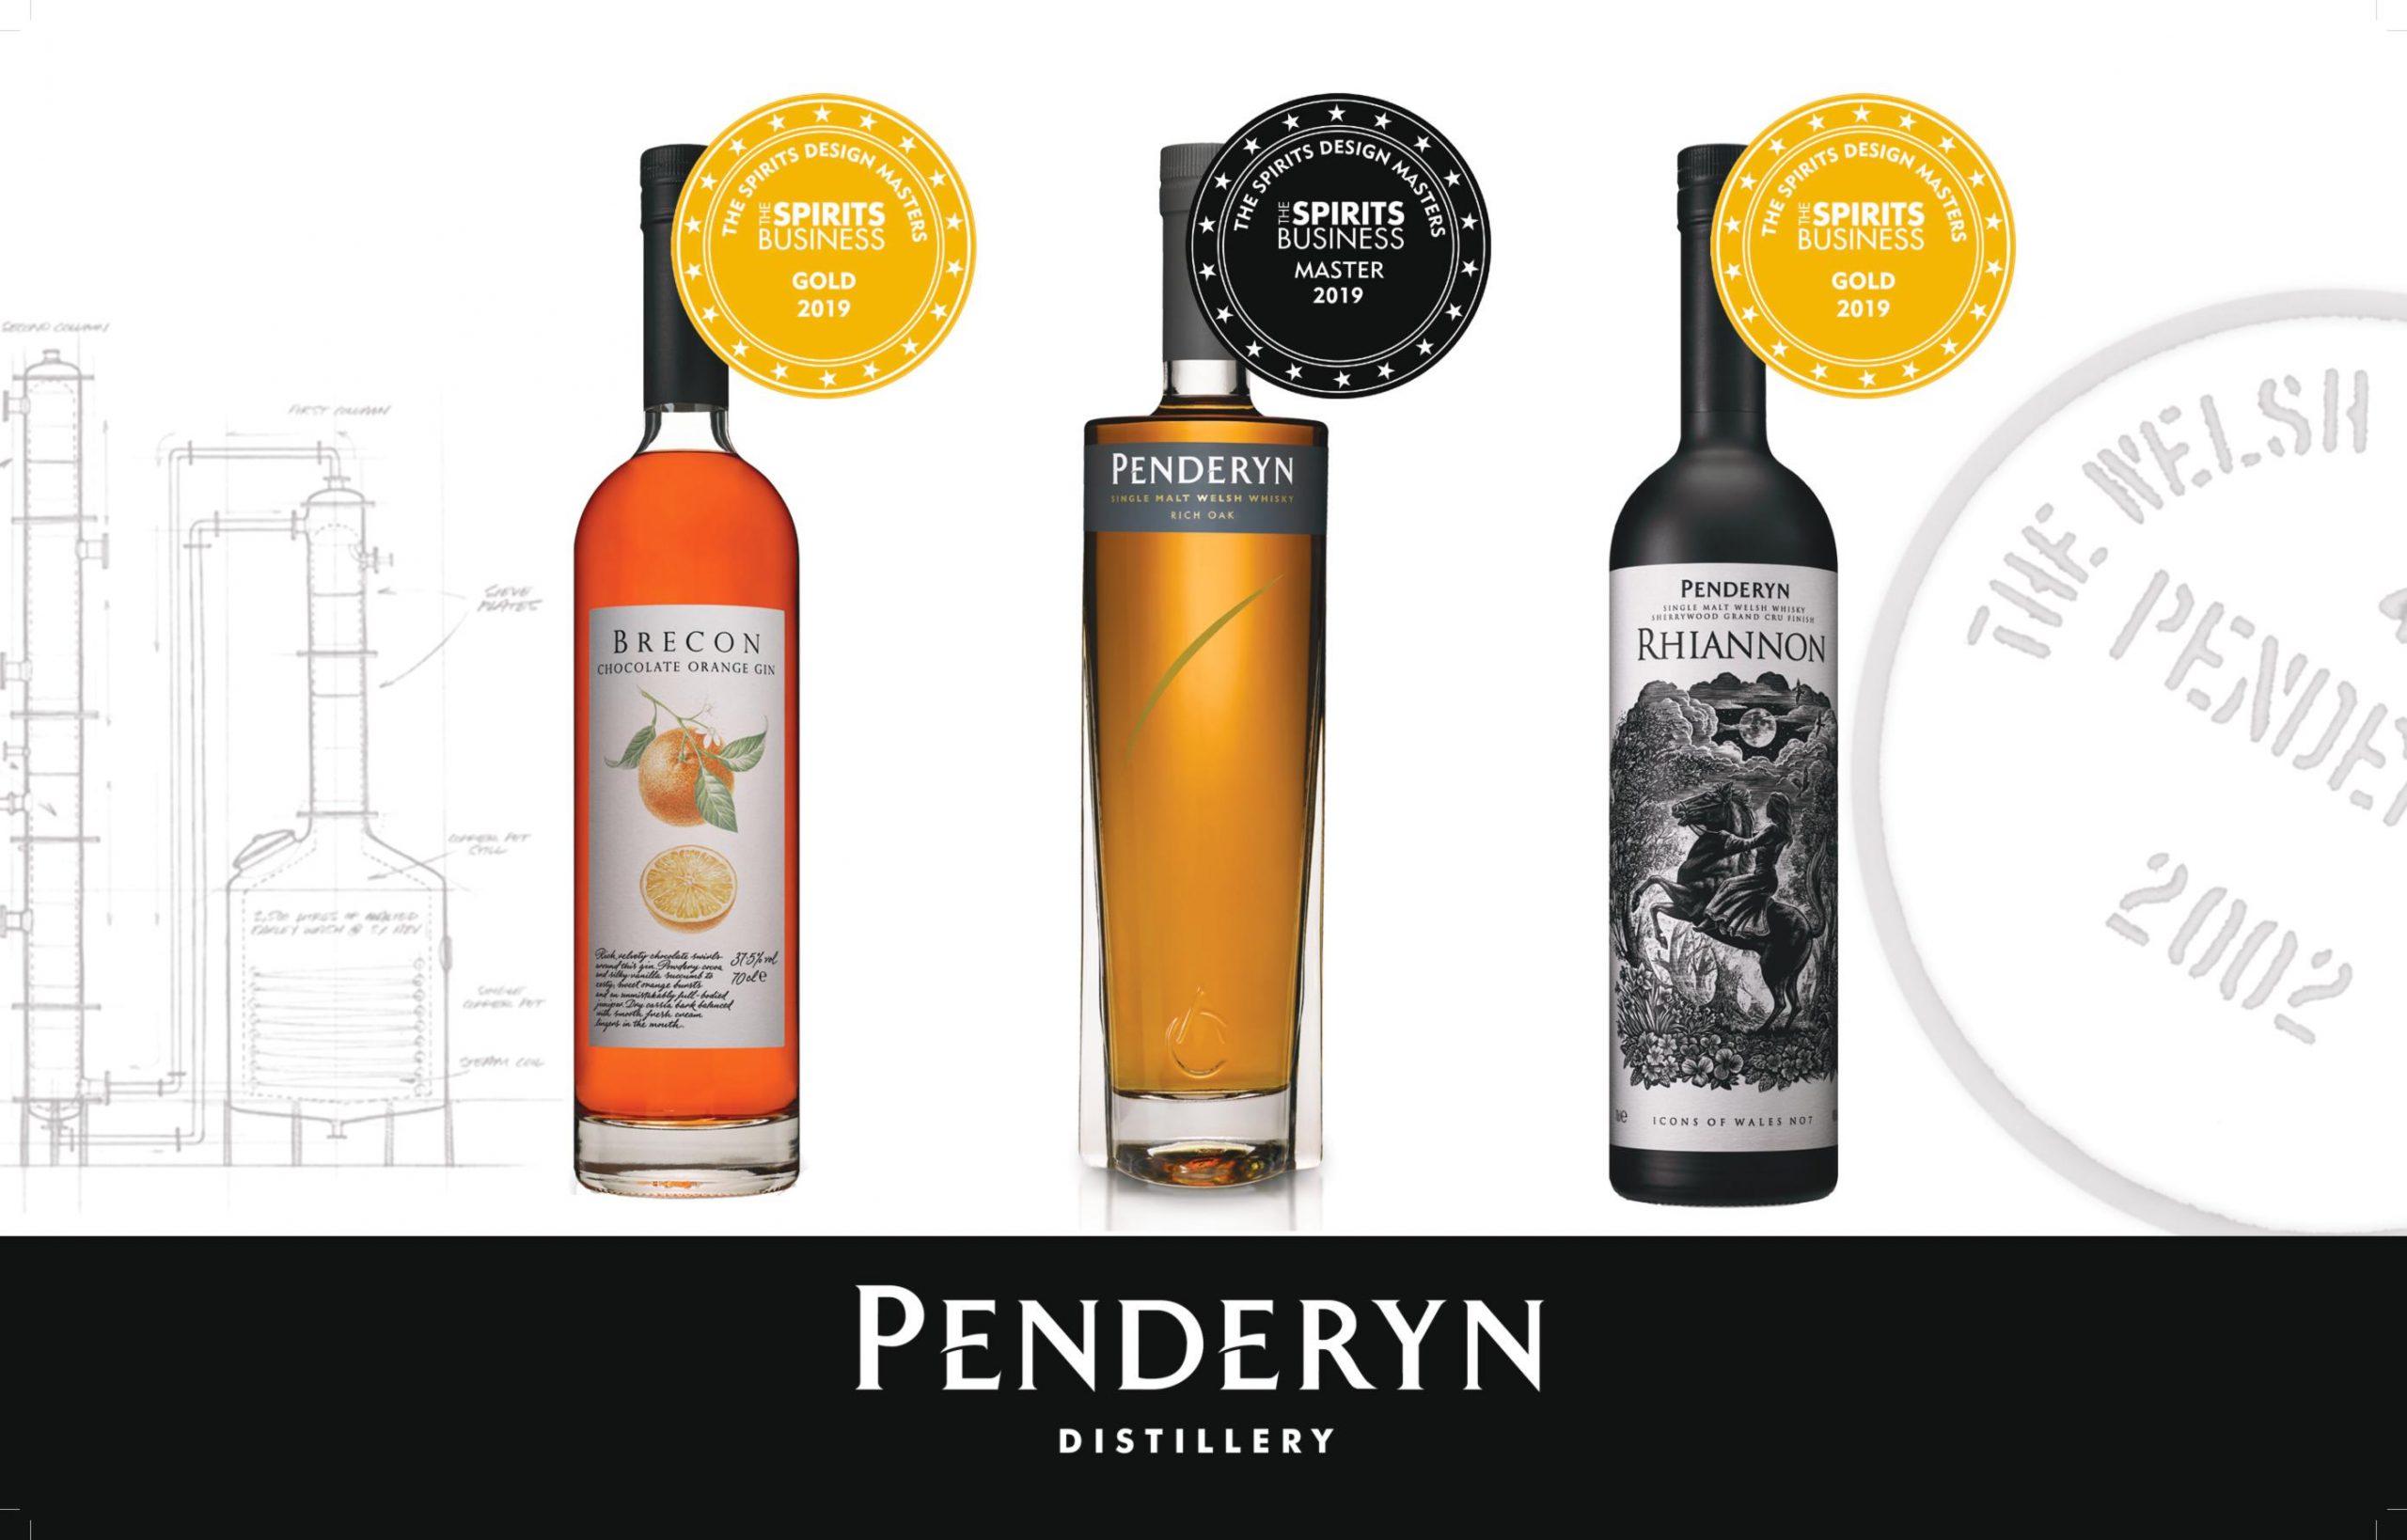 Spirits Business Penderyn Design